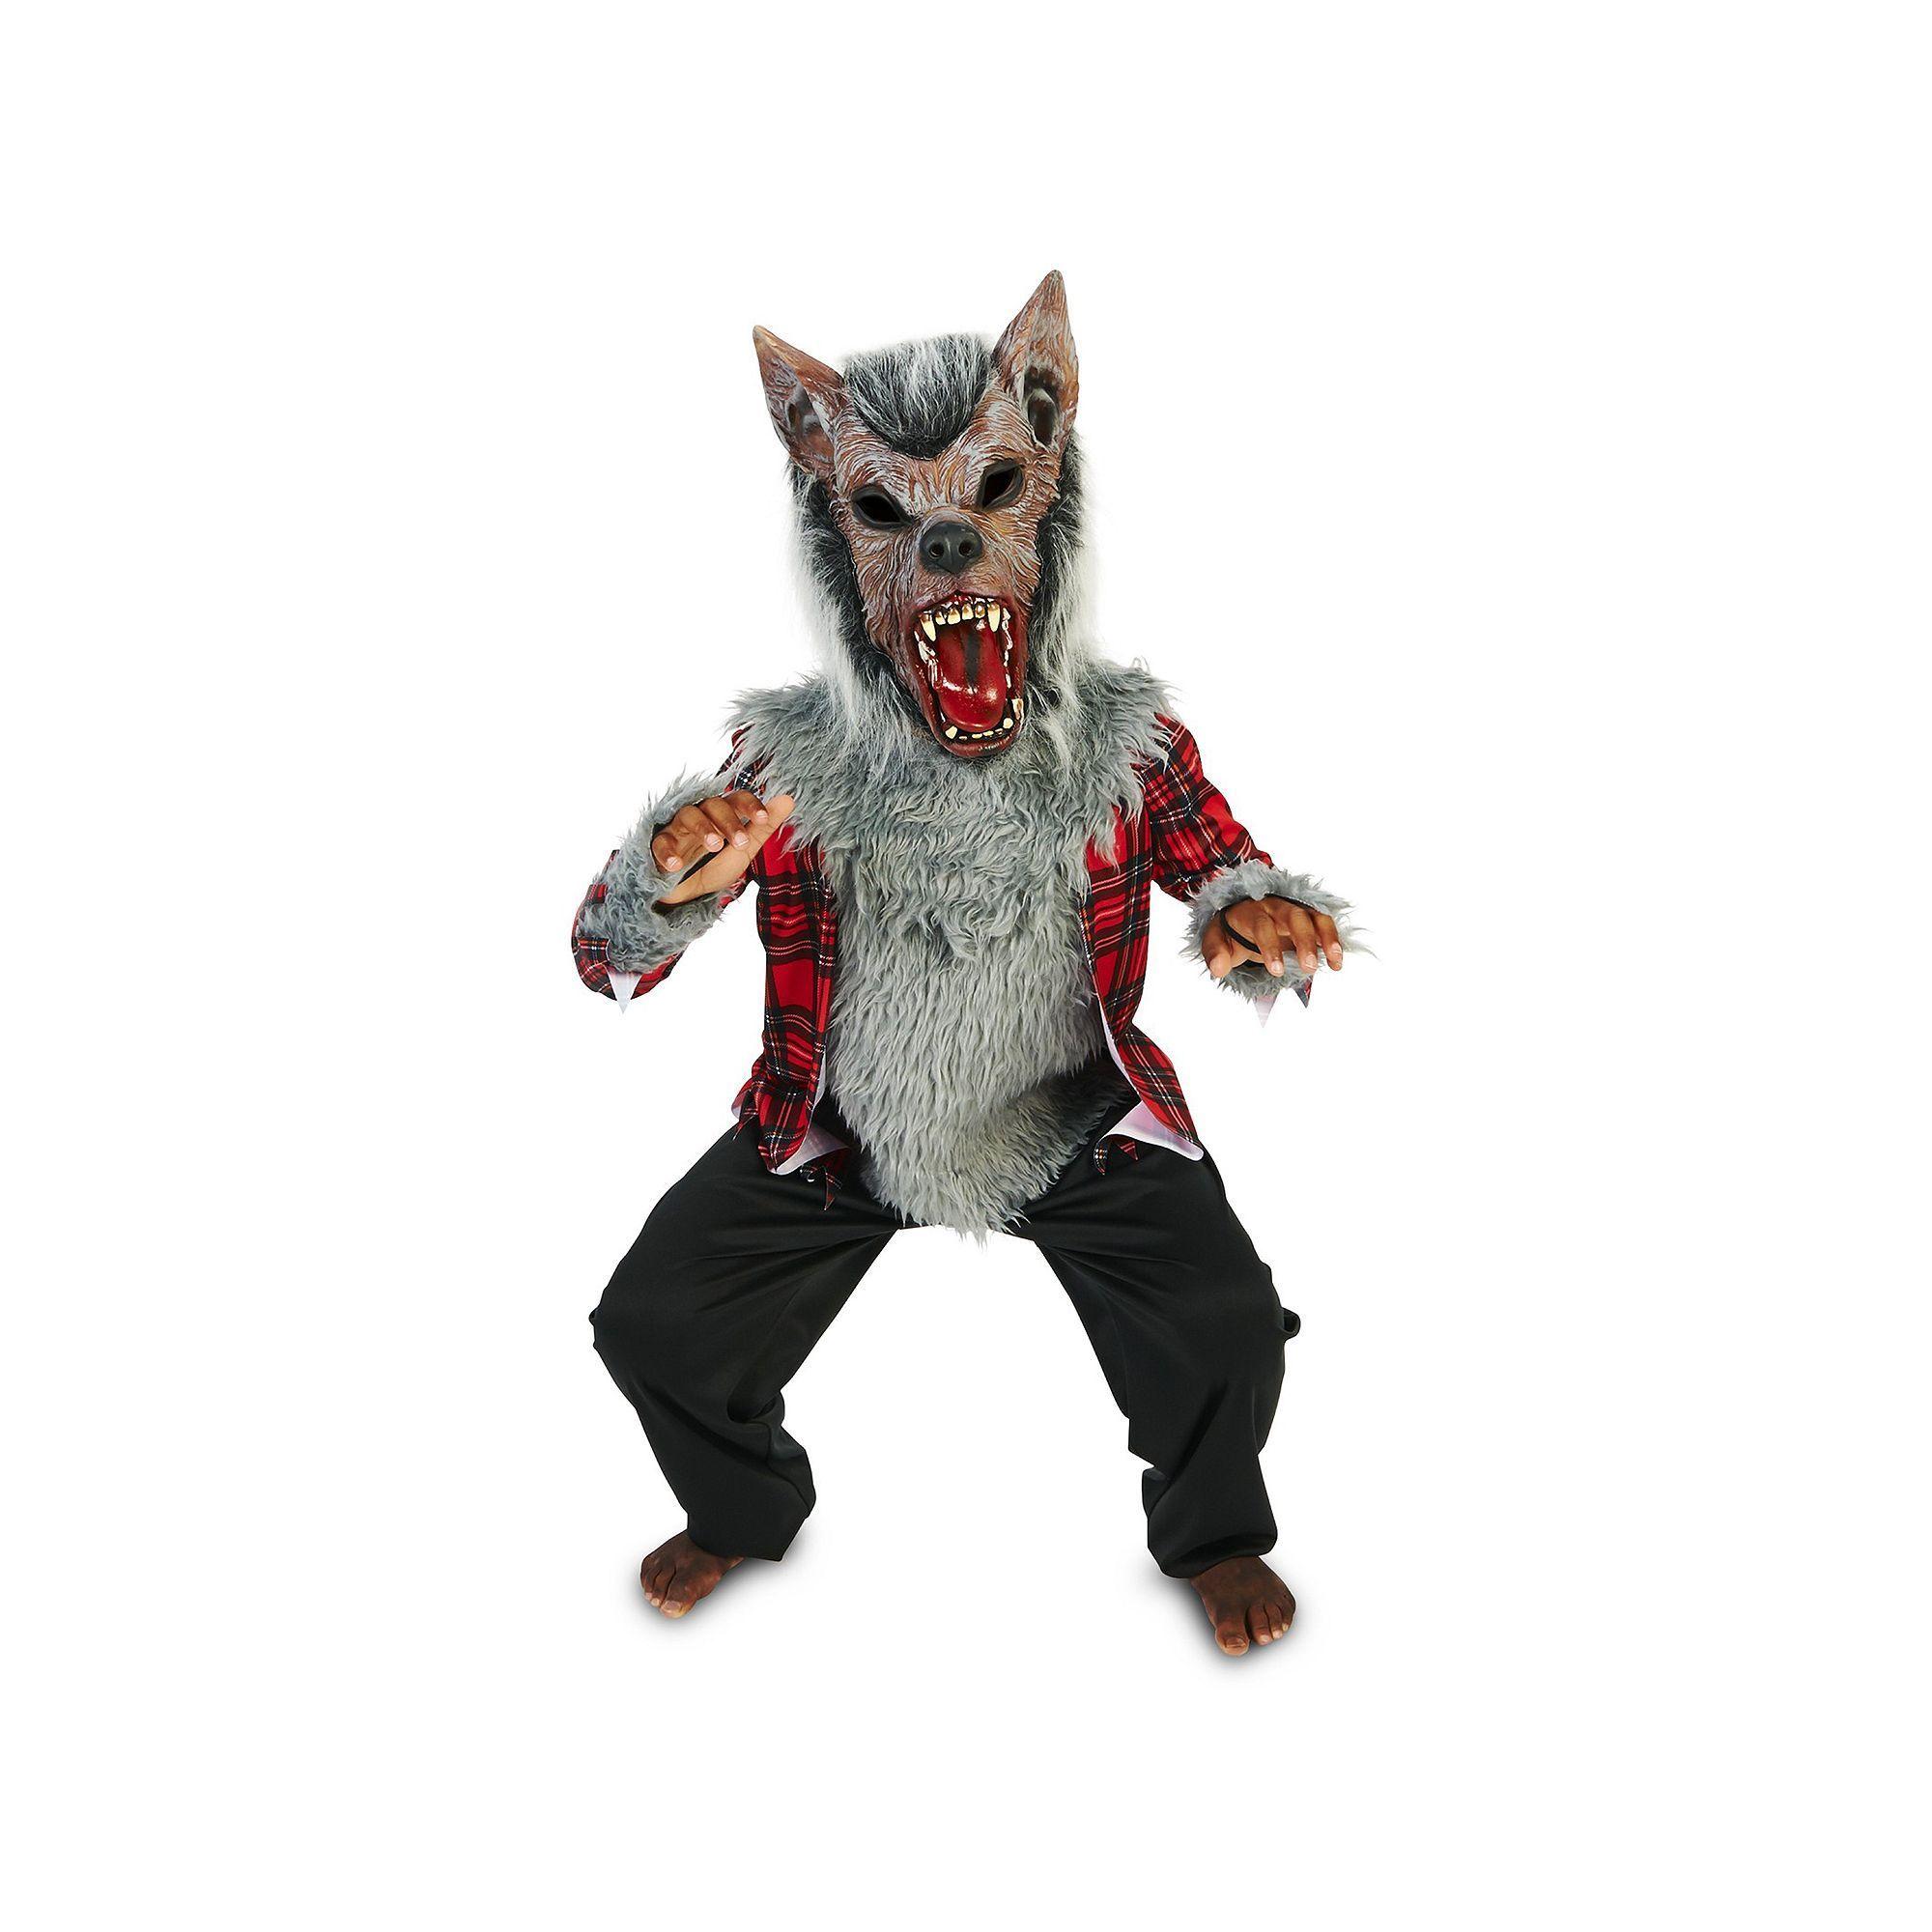 Plus Size Kids Full Moon Howl Werewolf Costume Boyu0027s Size 16-18 Multicolor  sc 1 st  Pinterest & Kids Full Moon Howl Werewolf Costume Boyu0027s Size: 12-14 Multicolor ...